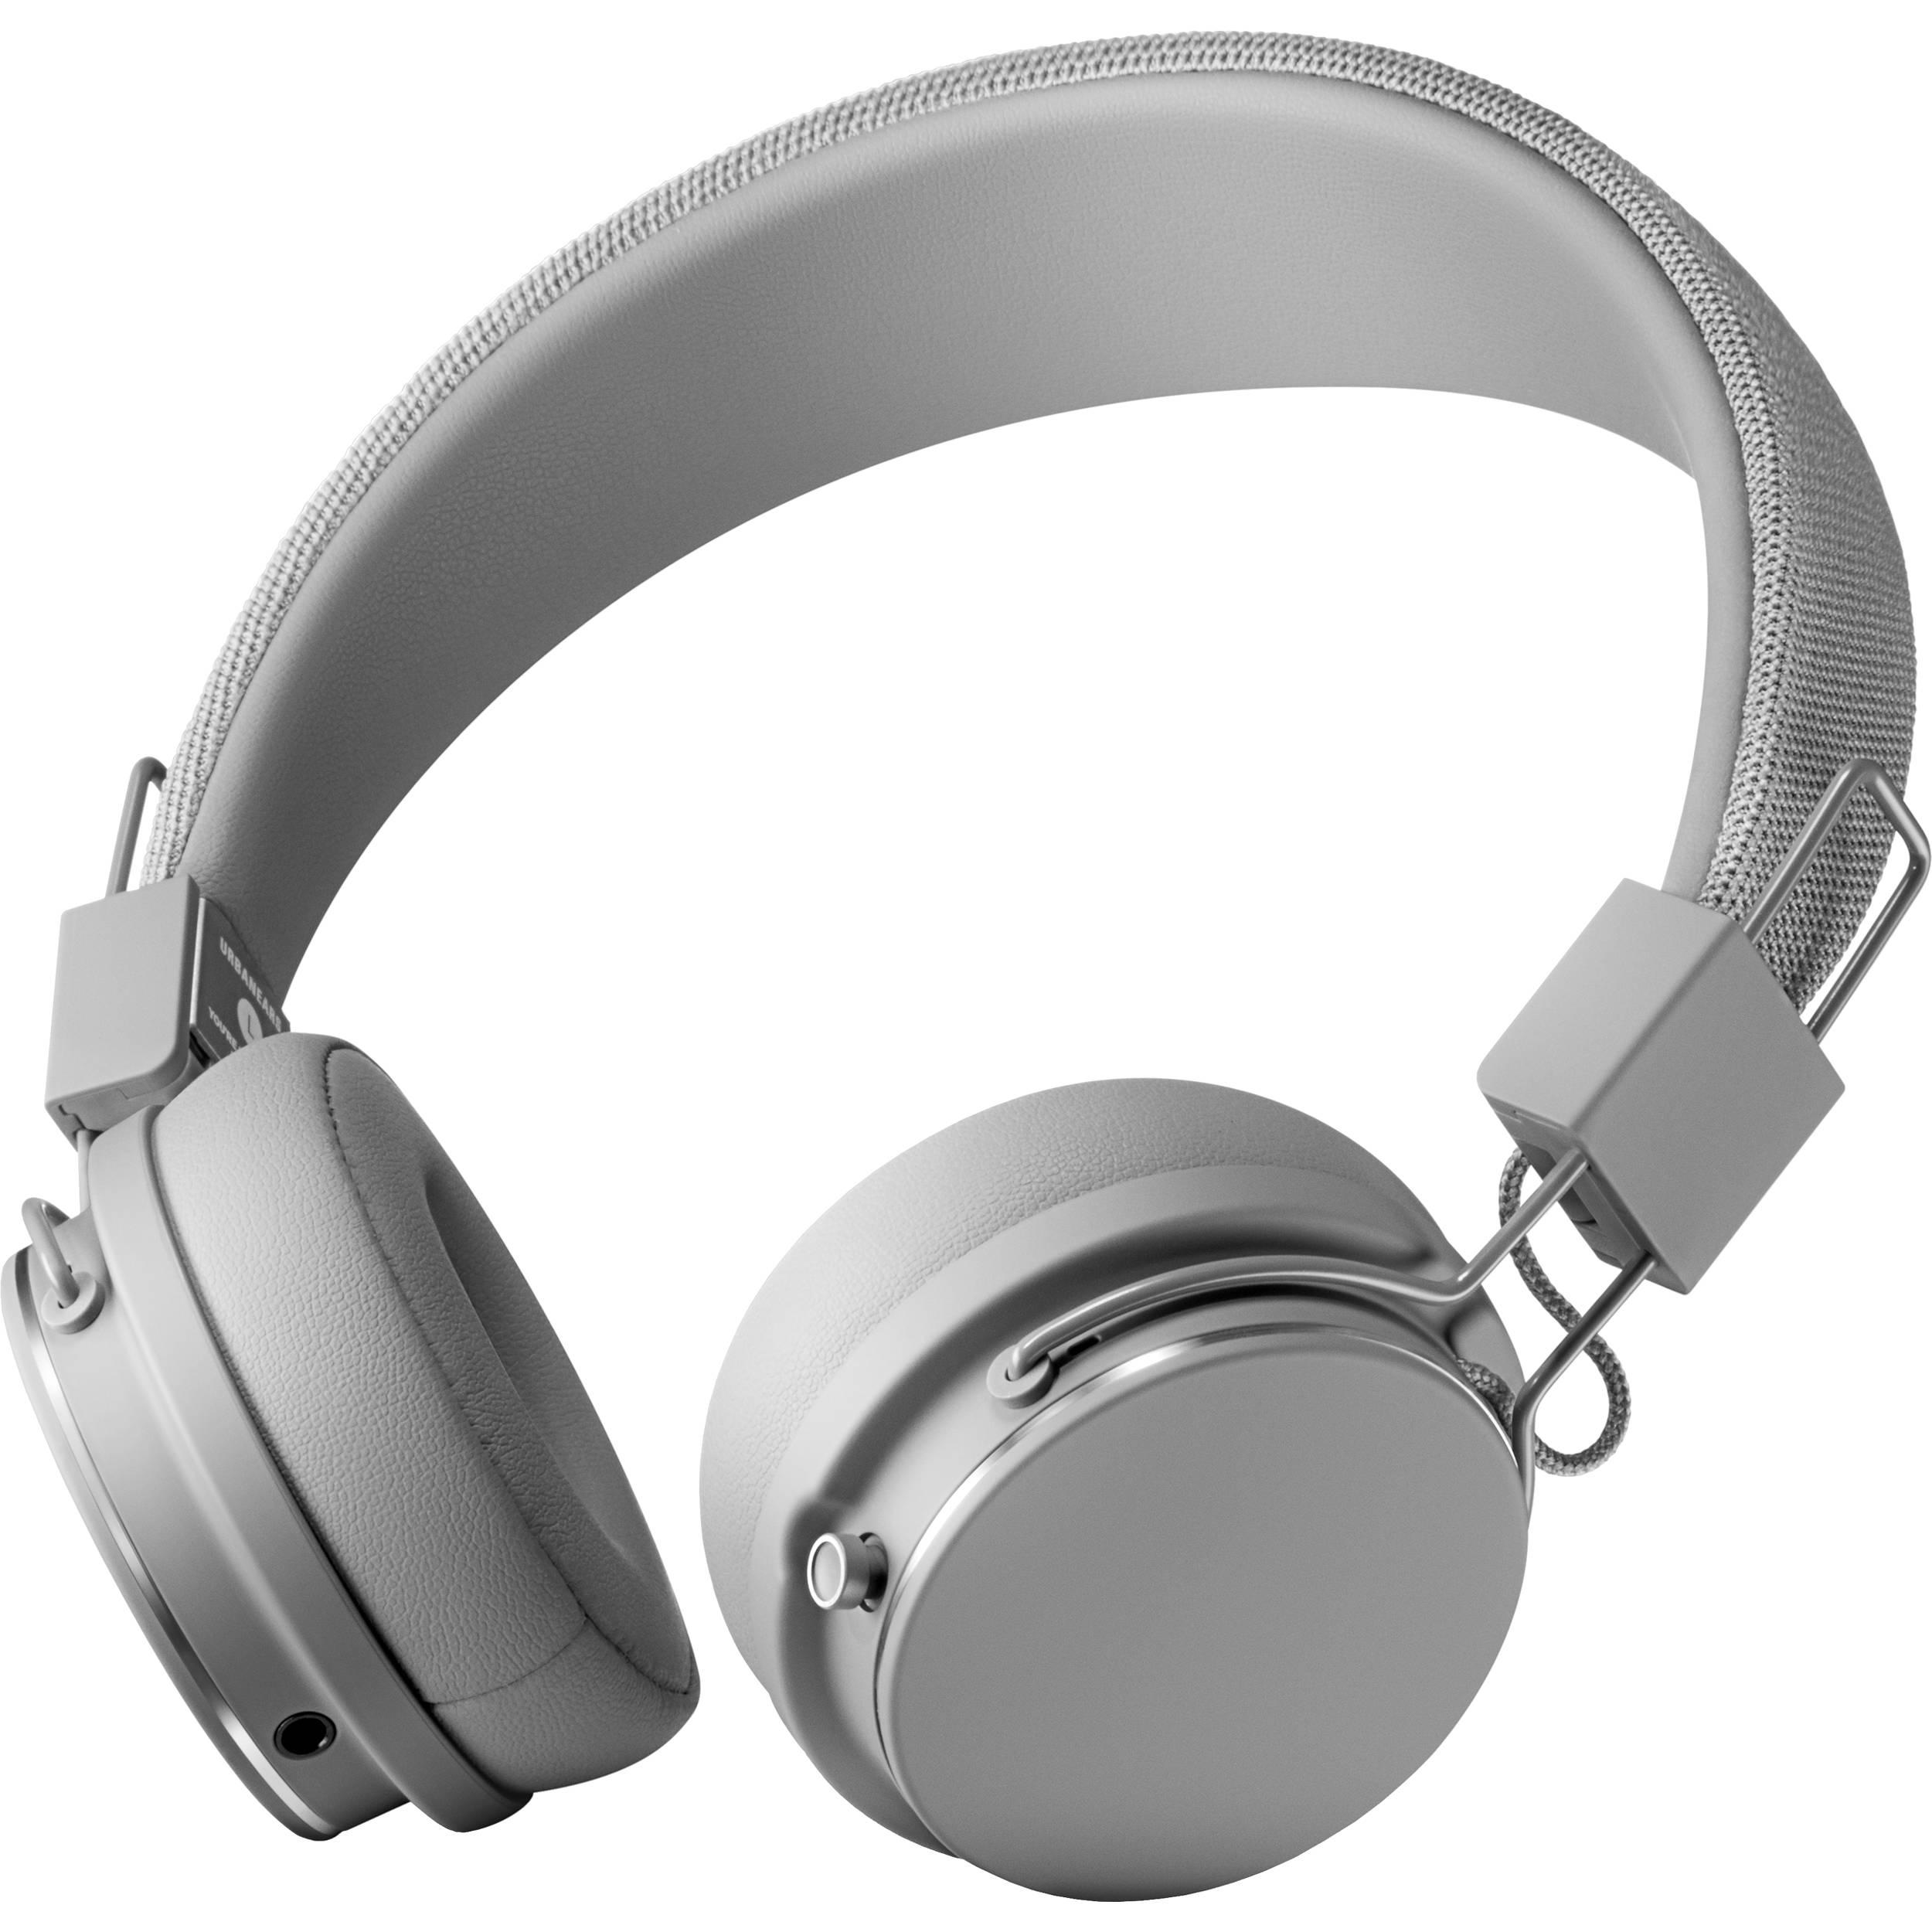 56aba450bdc Urbas Plattan 2 Wireless On Ear Headphones 04092111 B H. Urbas Plattan Adv  Bluetooth ...